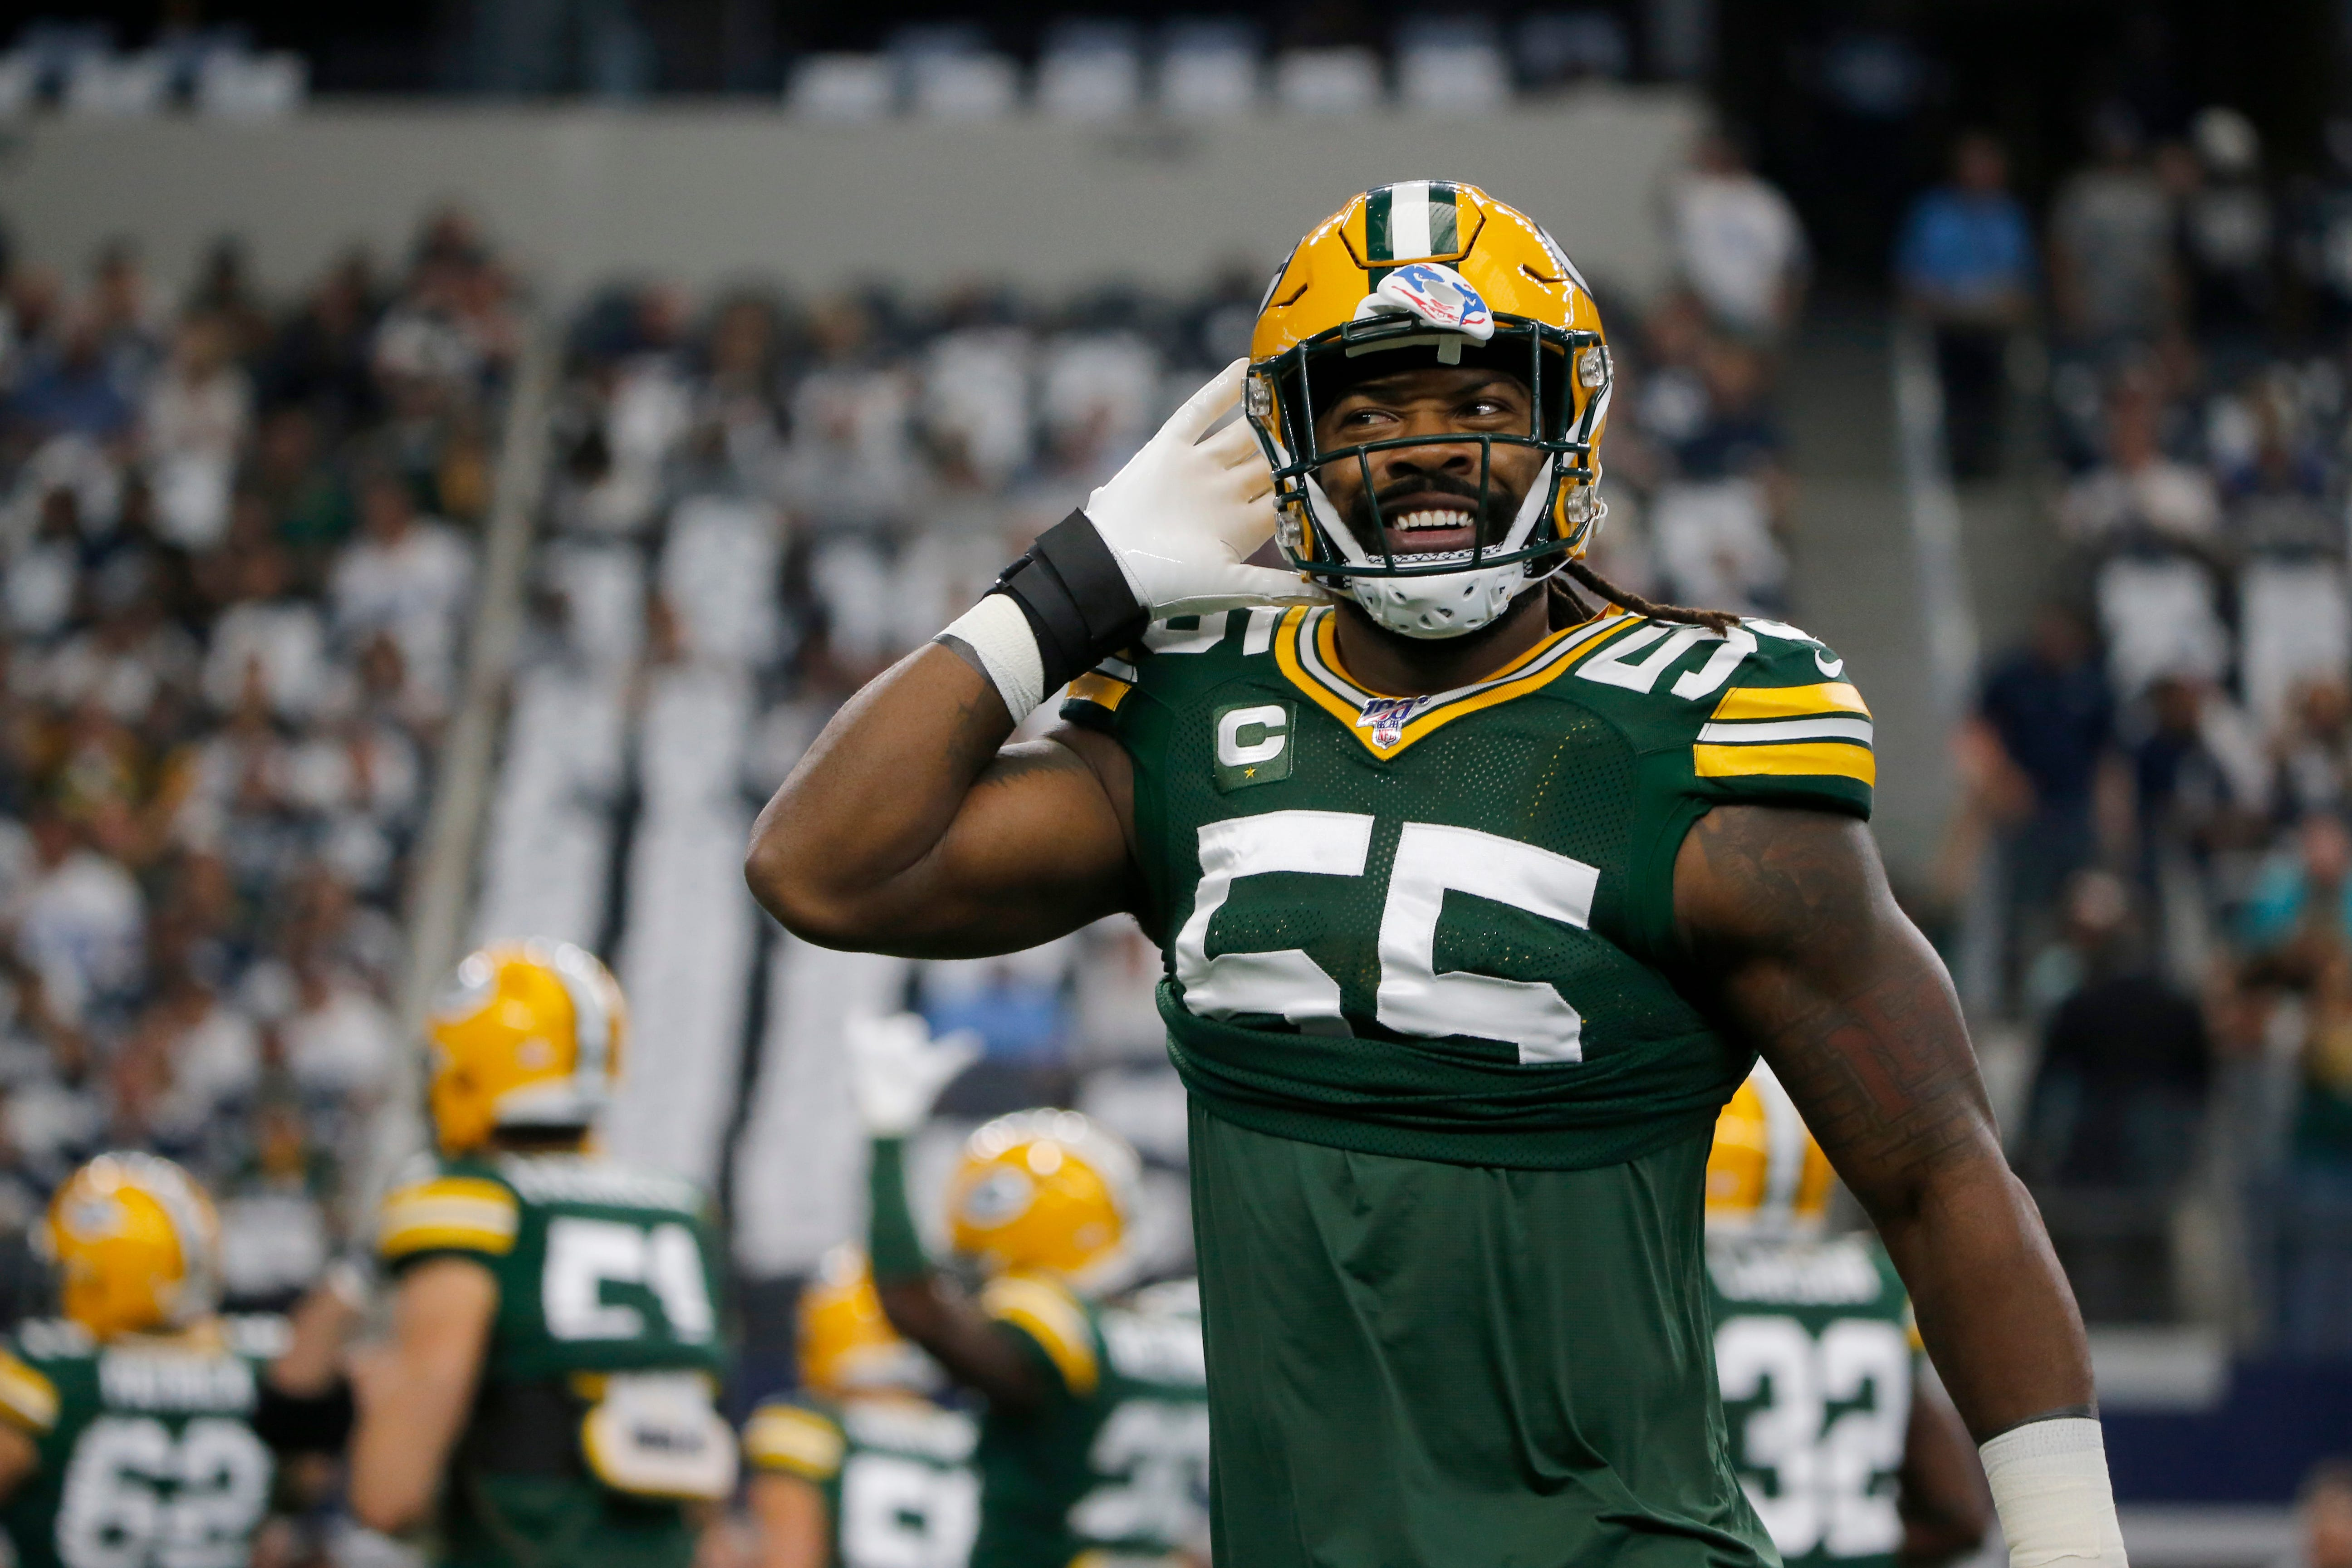 Packers  defense brings heat on Cowboys  Ezekeil Elliott, Dak Prescott after focusing on fundamentals